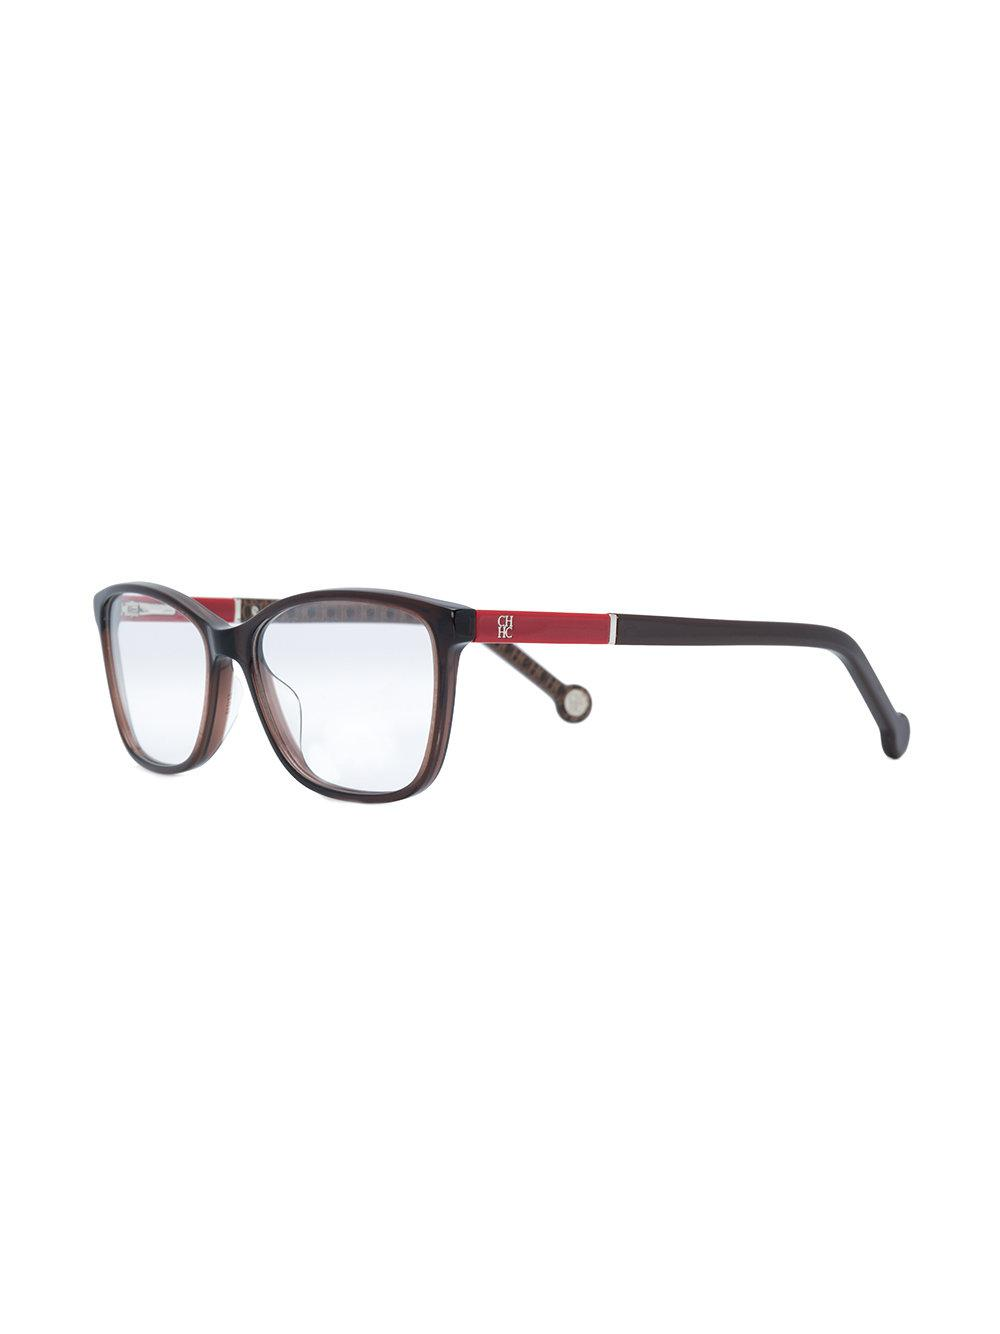 d8502135c4 CH by Carolina Herrera Rectangular Shape Glasses in Brown - Lyst